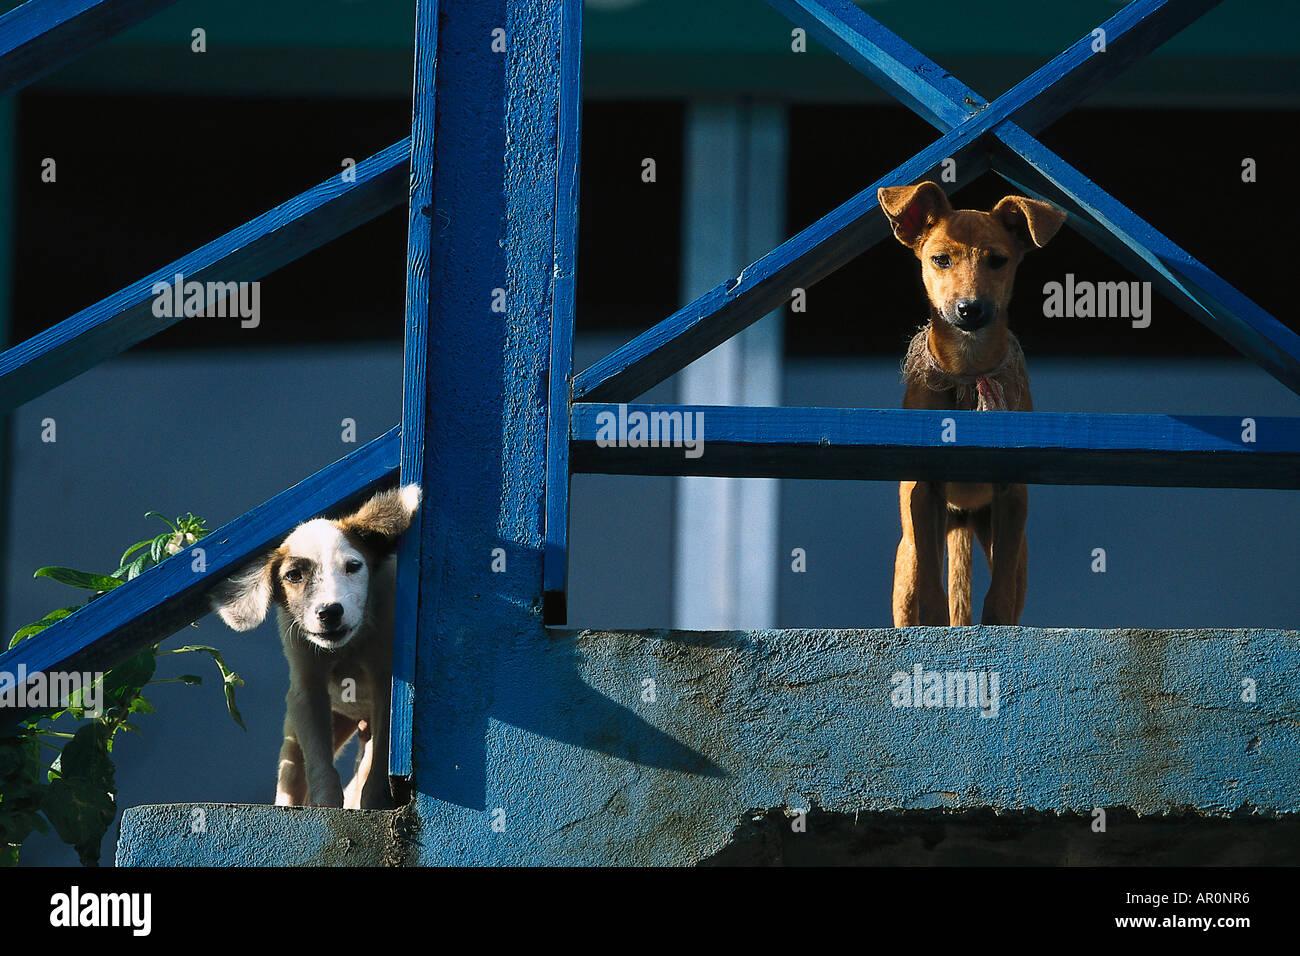 Hunde, Westindische Inseln Tobago, Karibik Stockbild